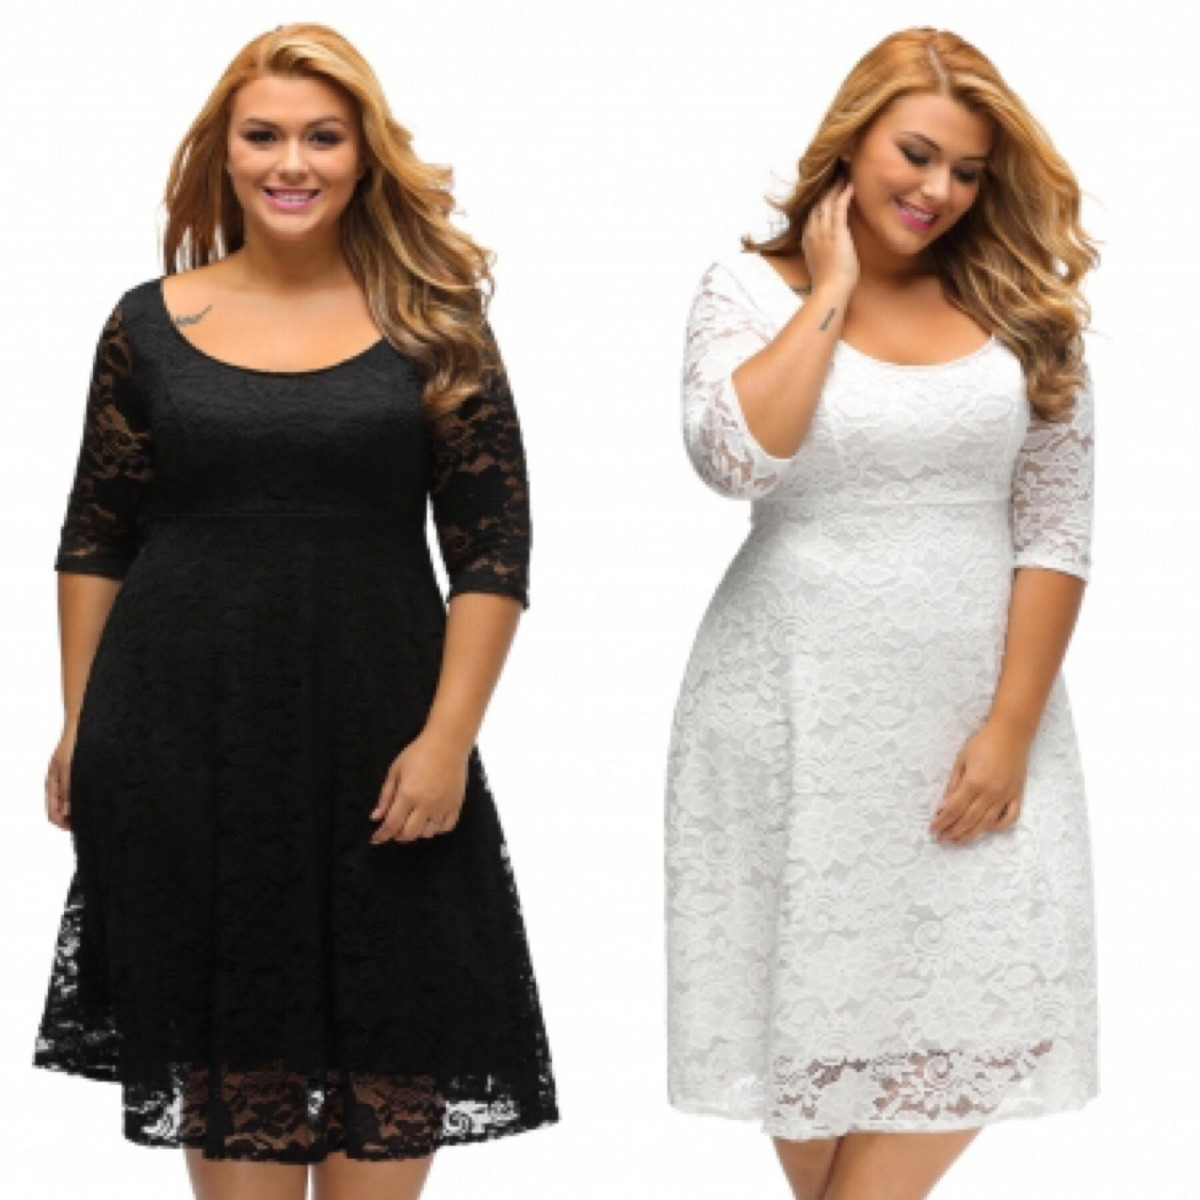 e8588623427 vestido tallas extras blanco negro encaje manga skater moda. Cargando zoom.